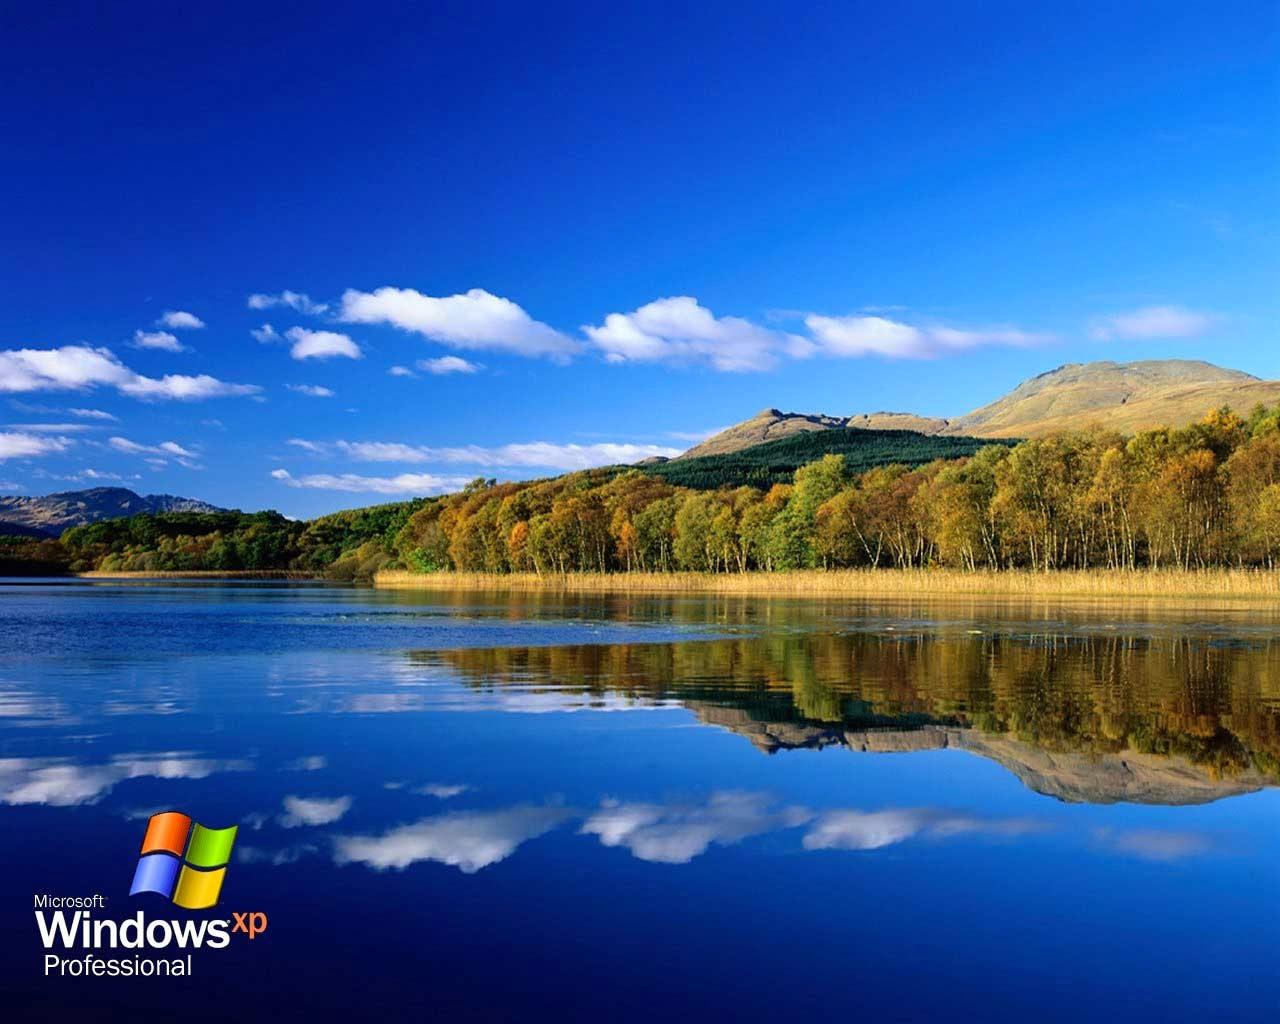 HD Wallpapers 1080p Windows Xp